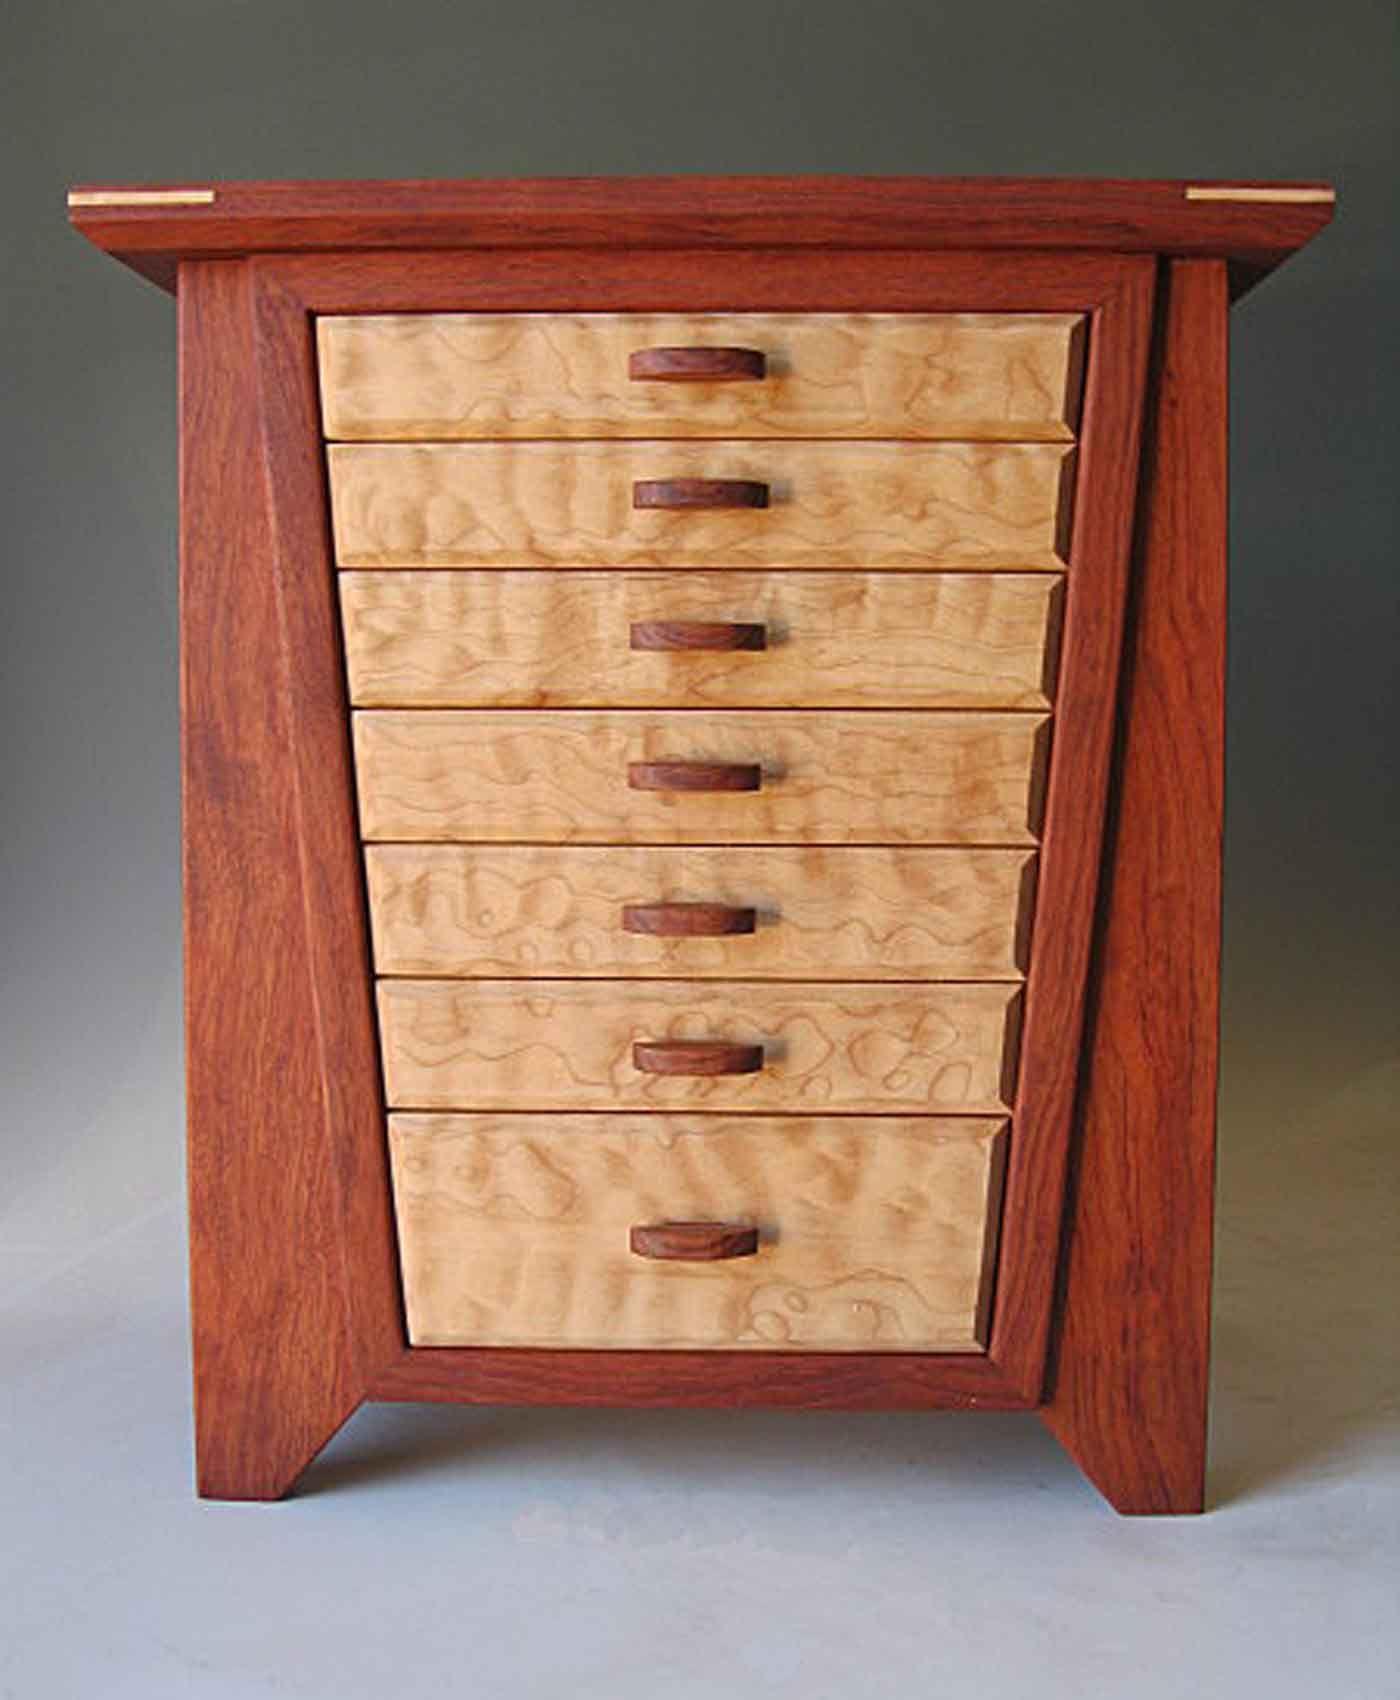 Handmade Quality Jewelry Box Made Of Bubinga Wood And Burl